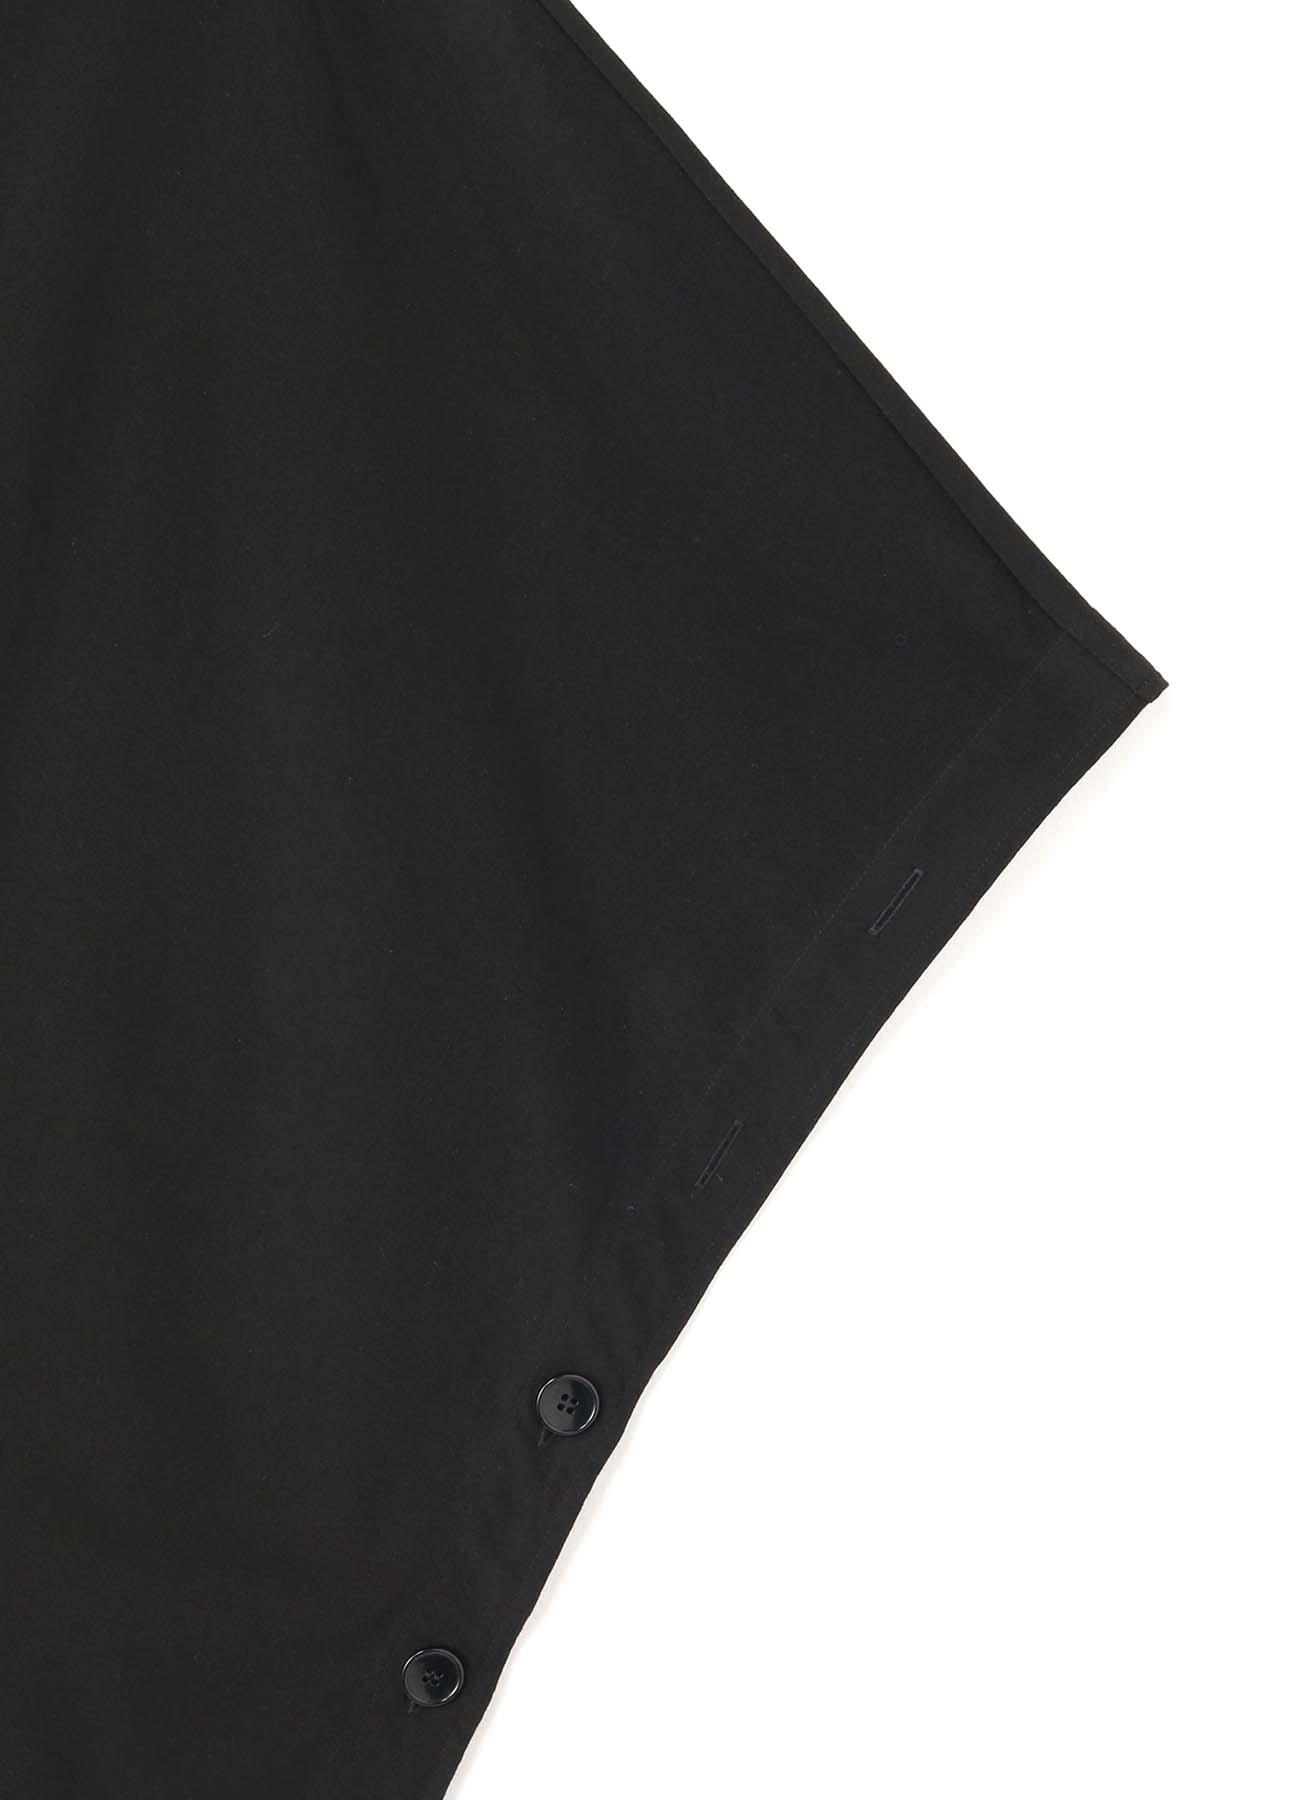 30/Cotton Jersey Big Poncho Cut Sew